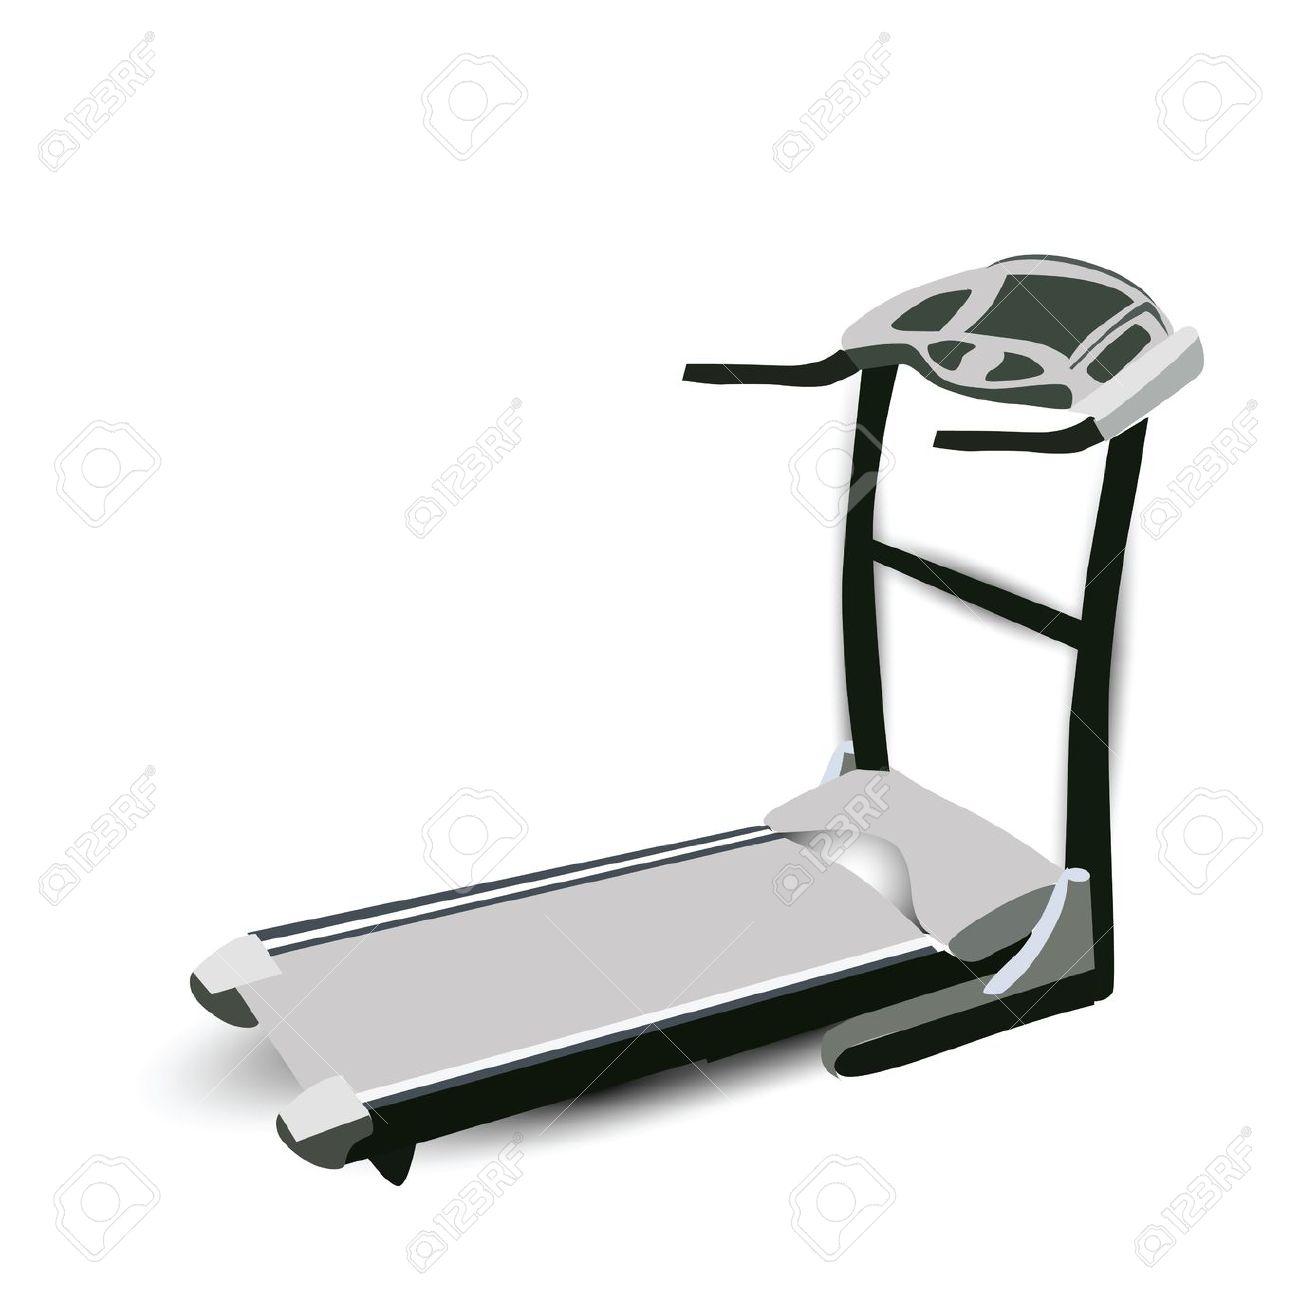 Treadmill clipart no background.